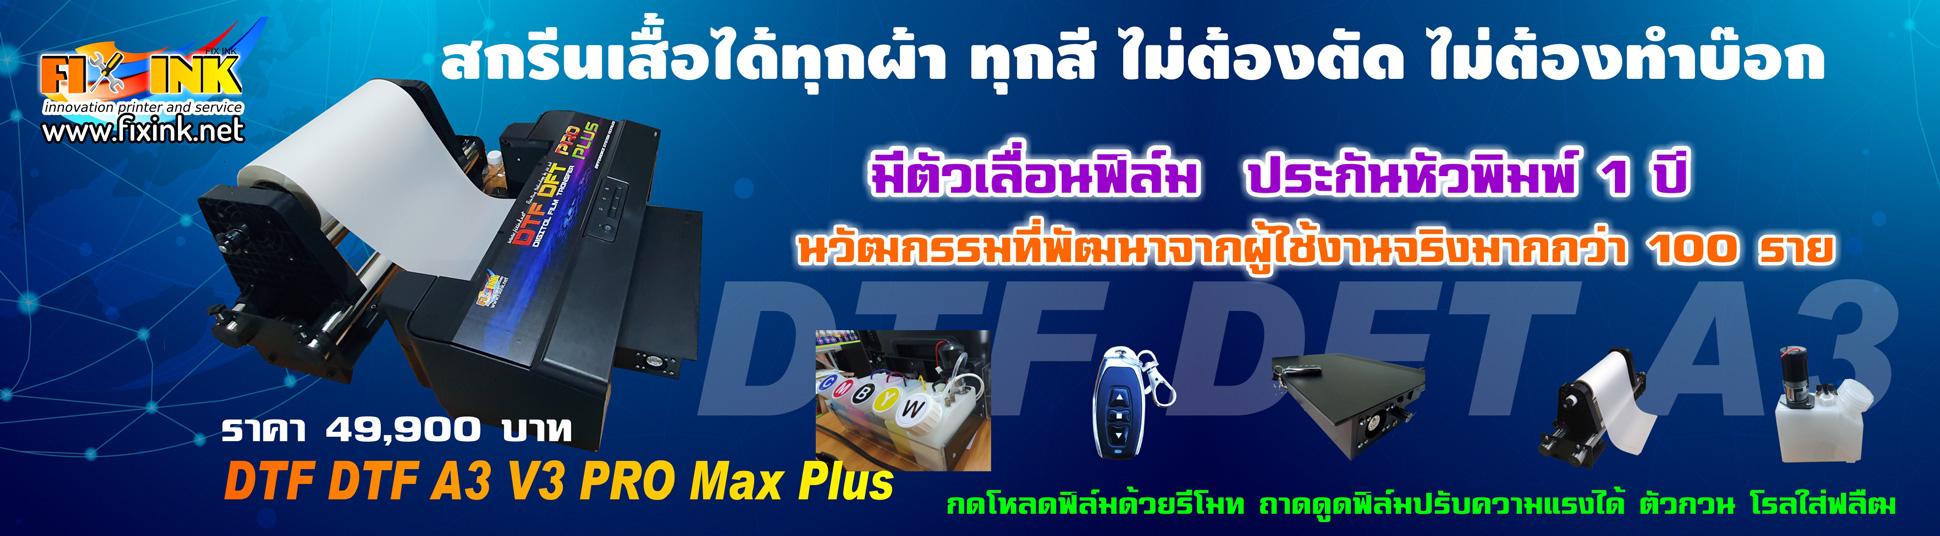 dtf-a3-pro-max-plus.jpg